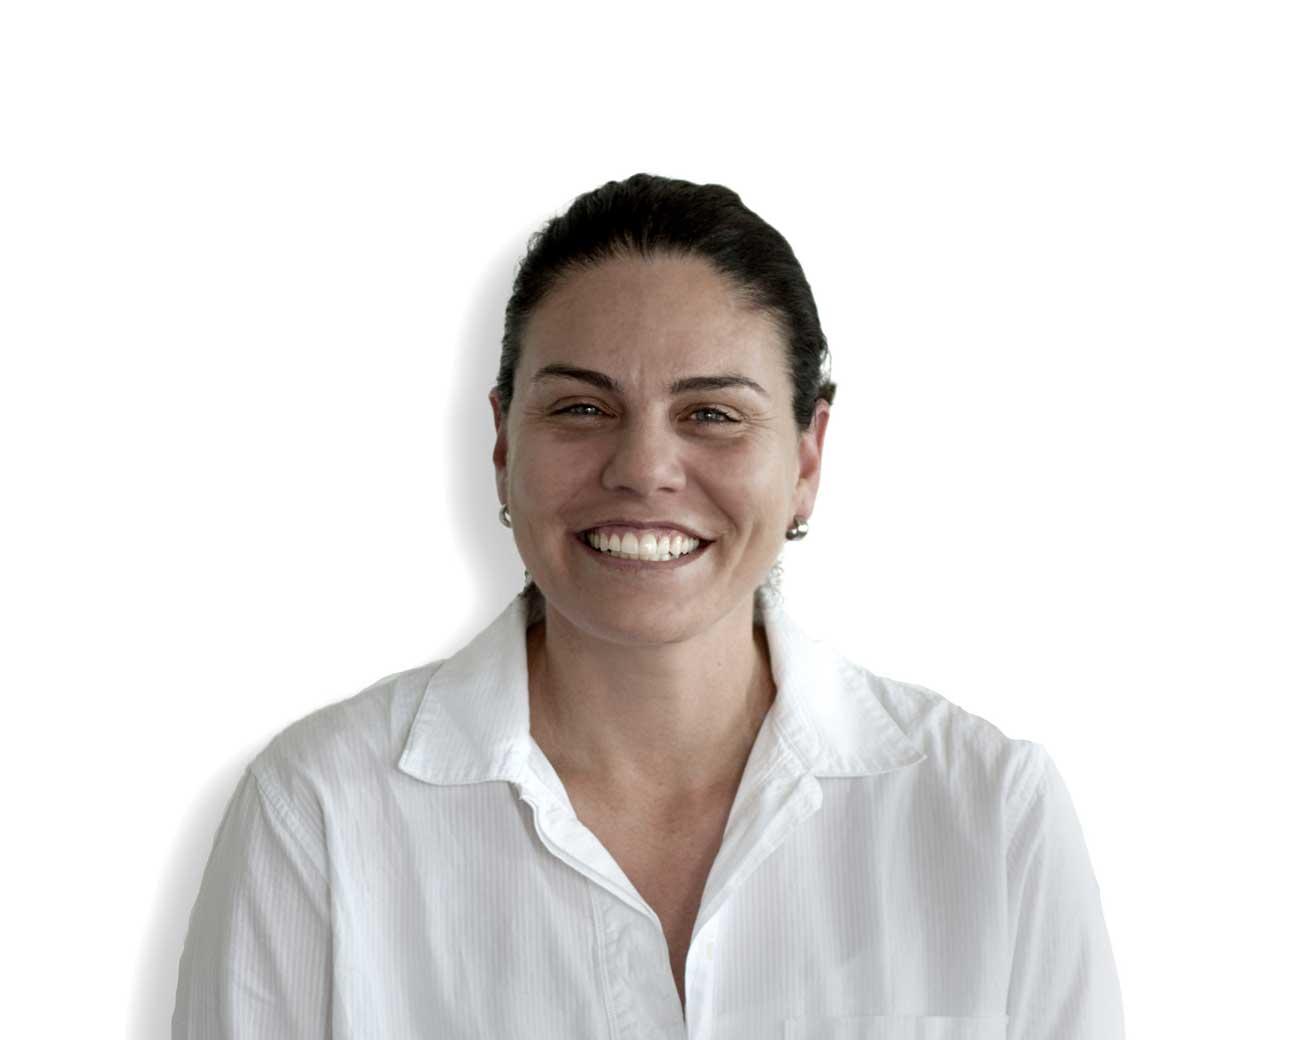 Jenna Knudsen (B.Arch '97)